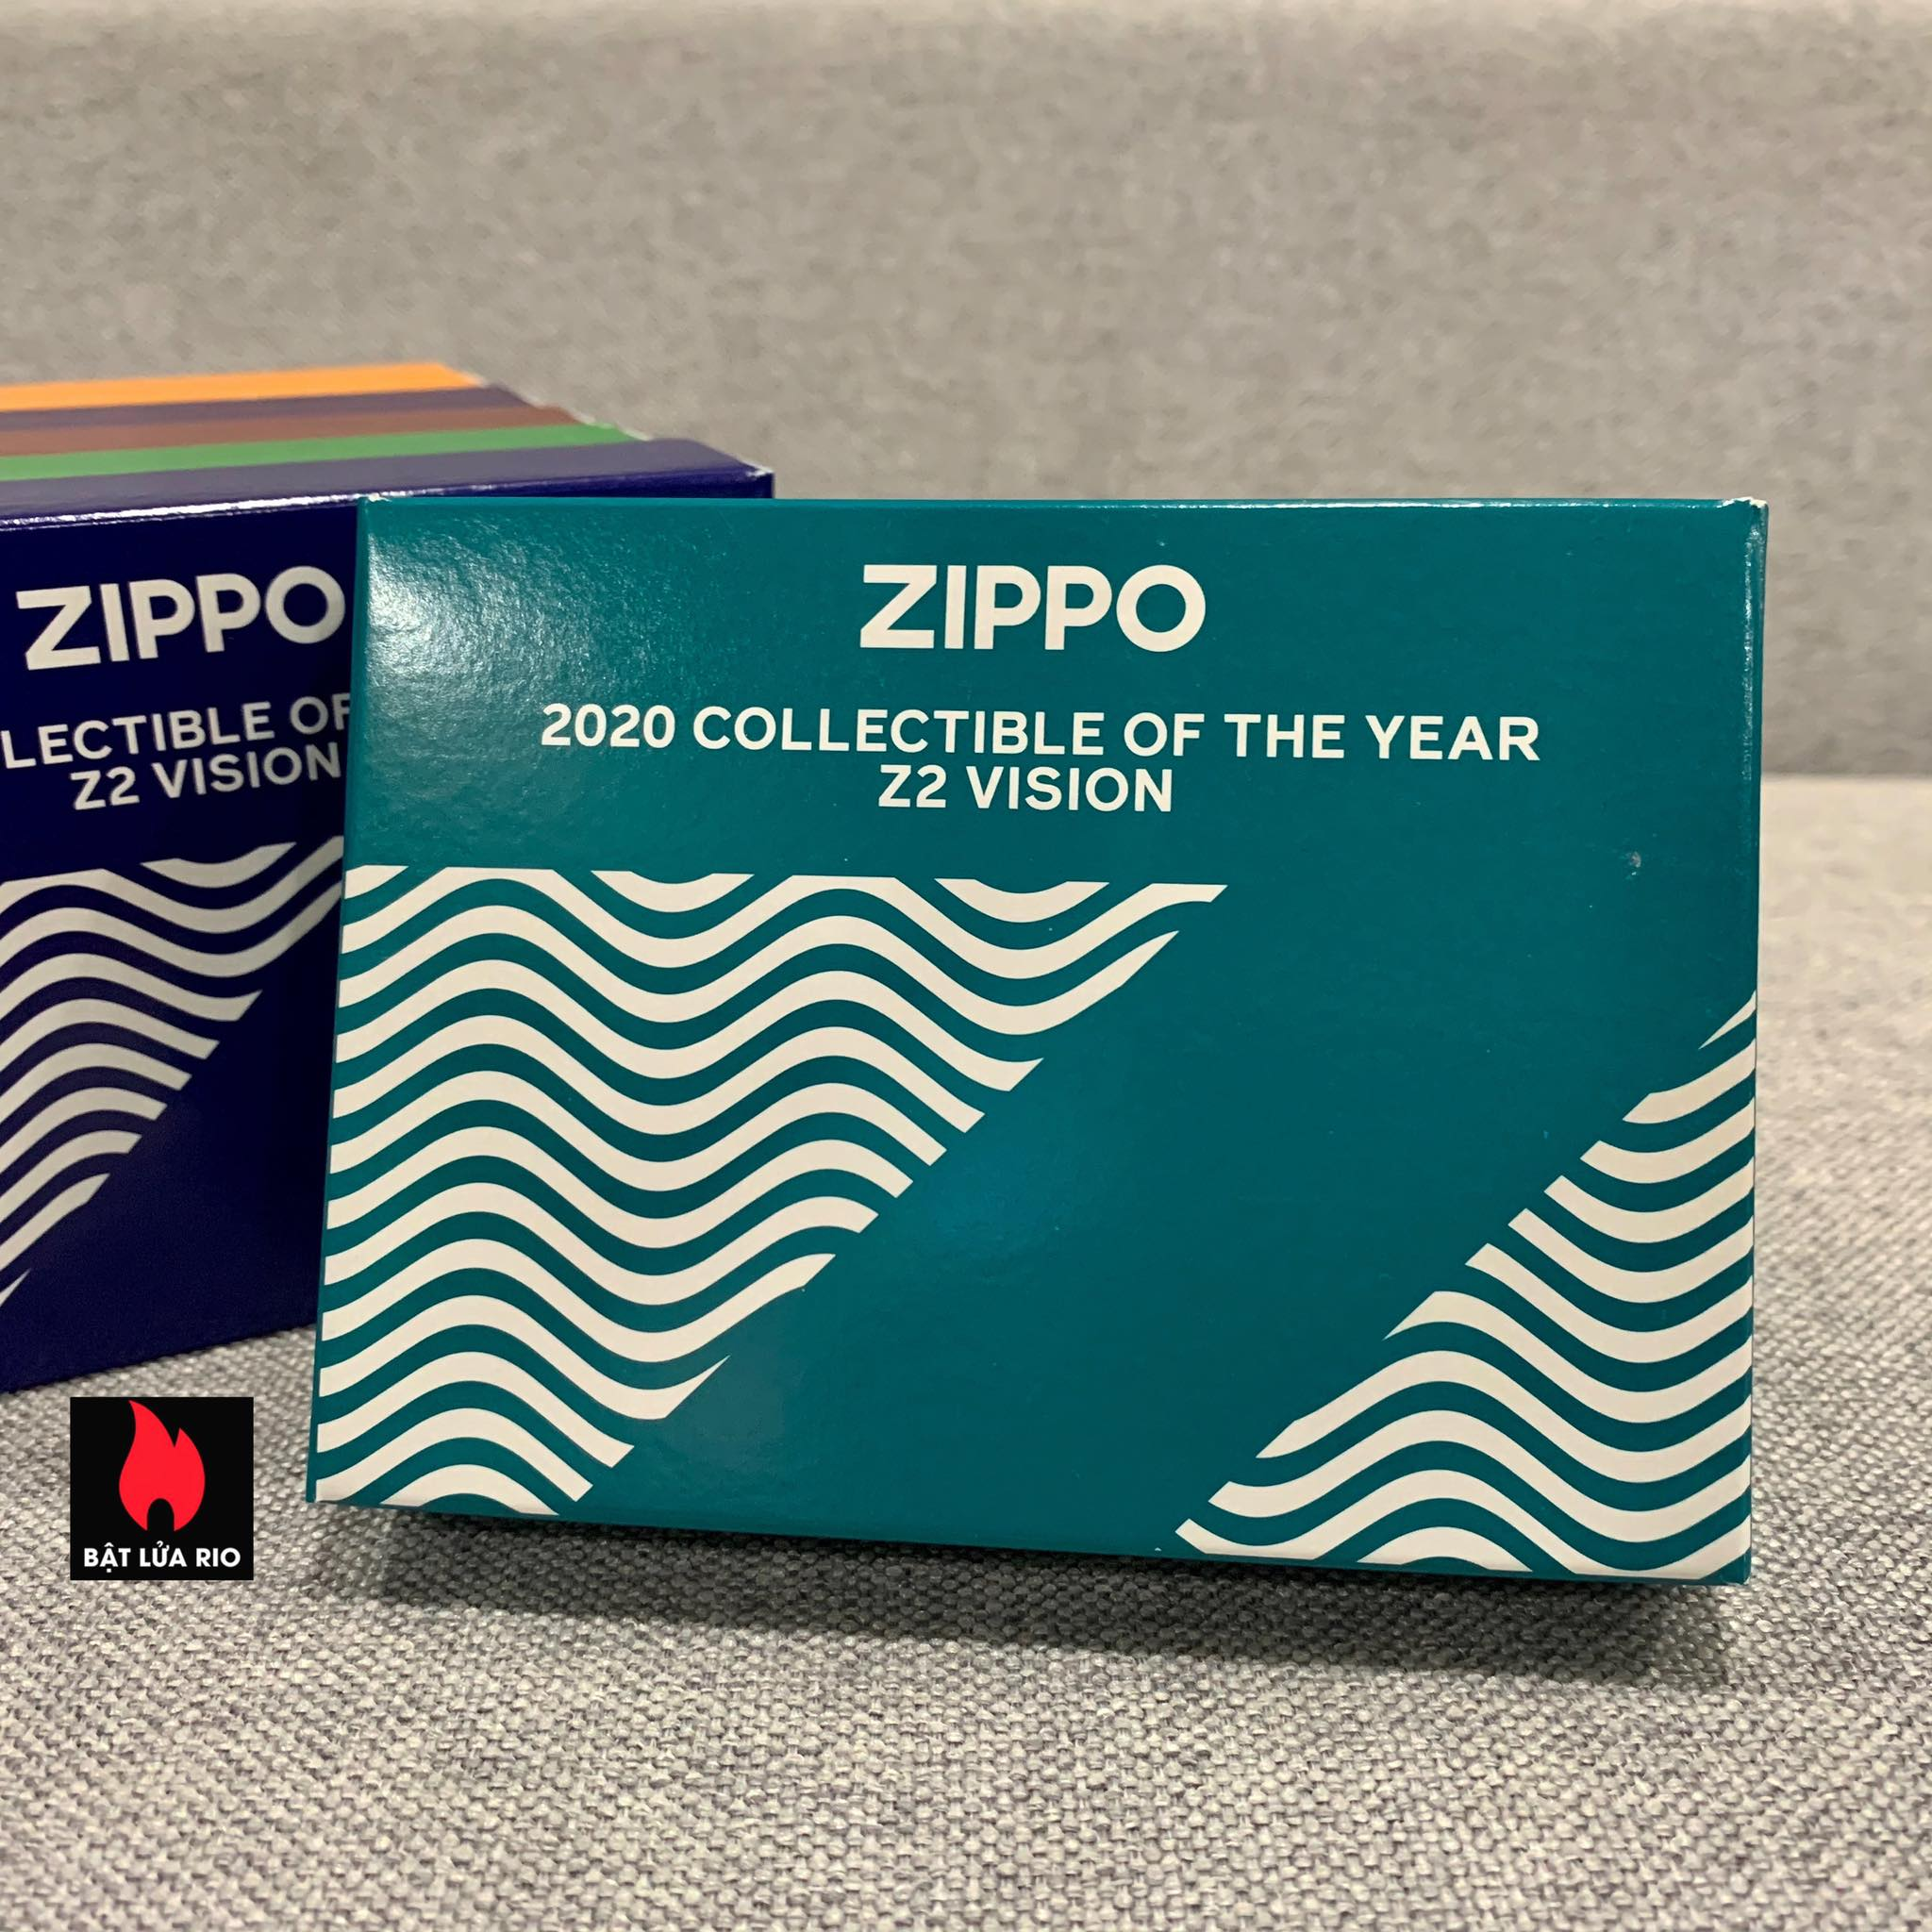 Zippo 49194 - Zippo 2020 Collectible Of The Year - Zippo Coty 2020 - Zippo Z2 Vision 44